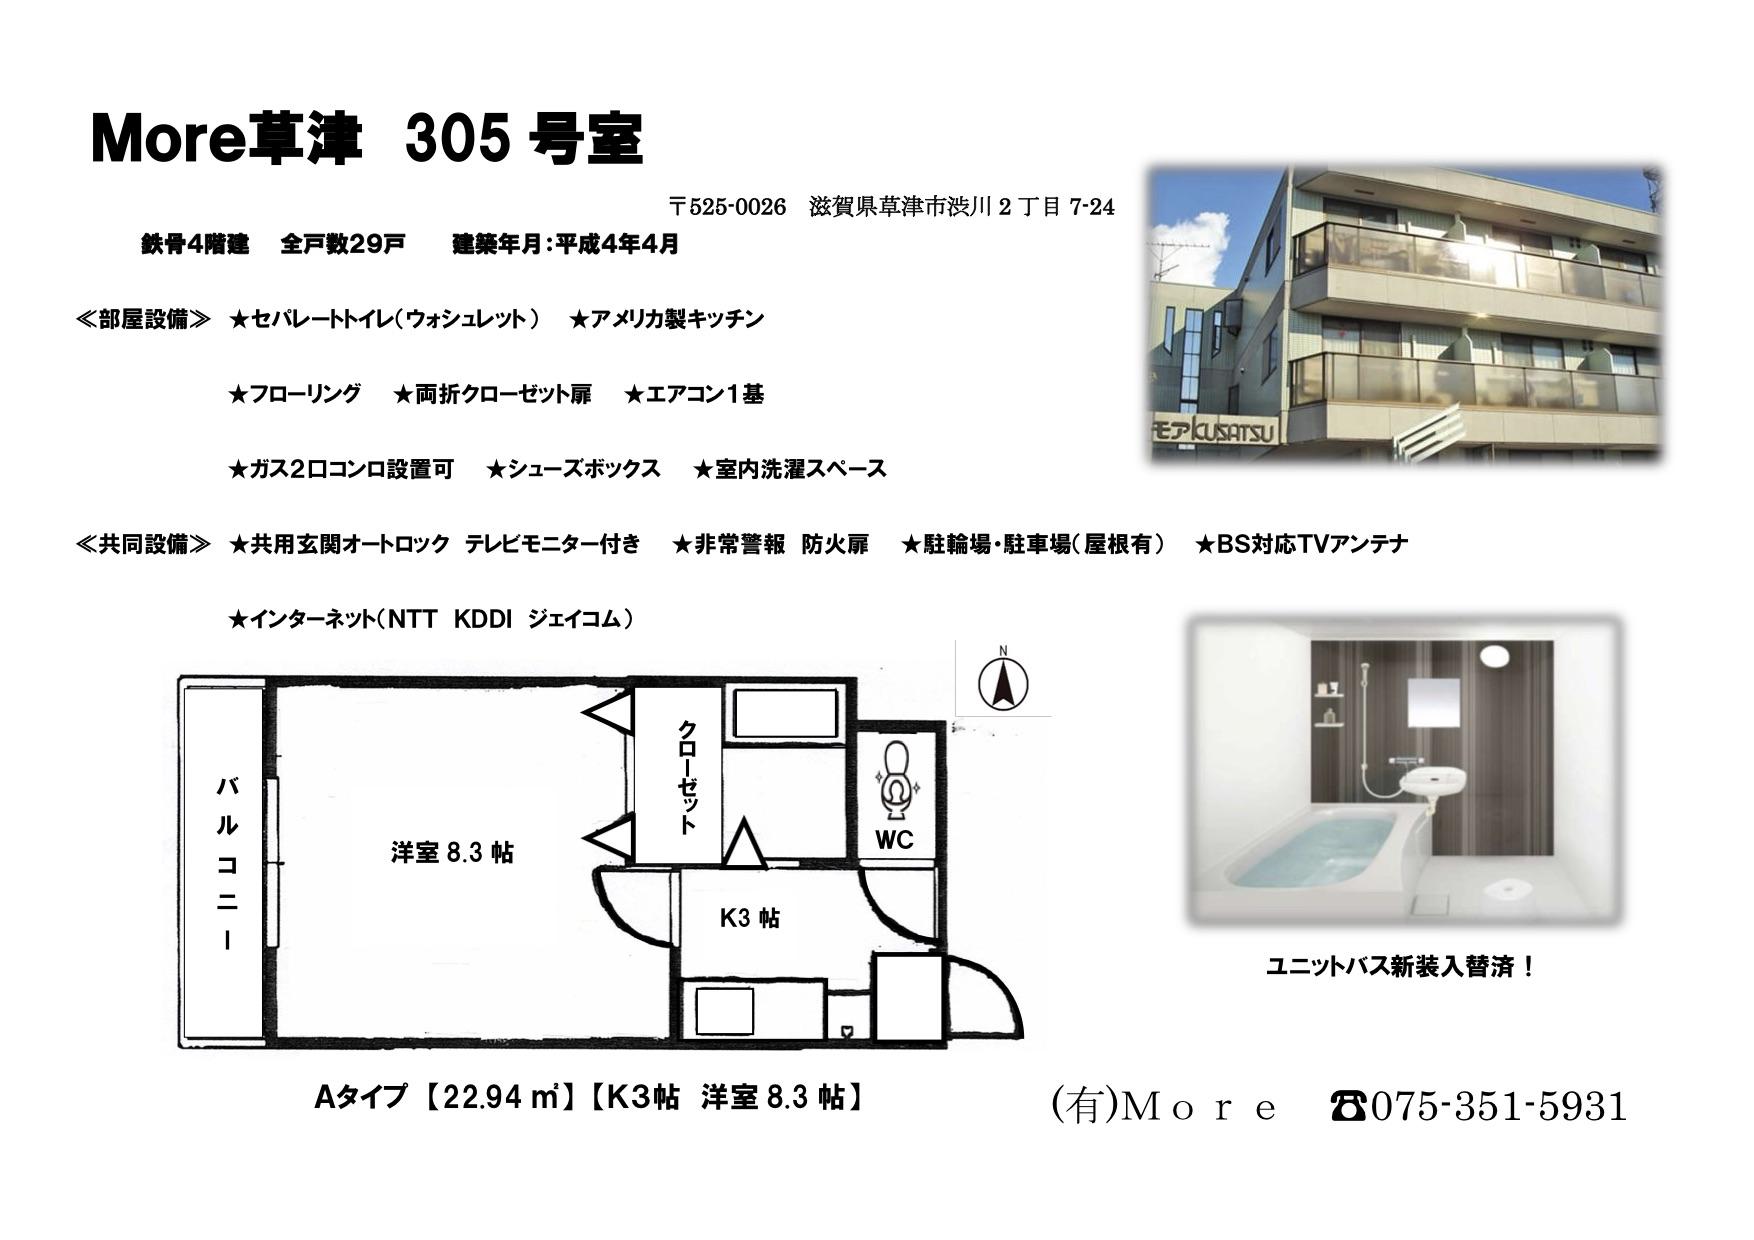 More草津 305号室